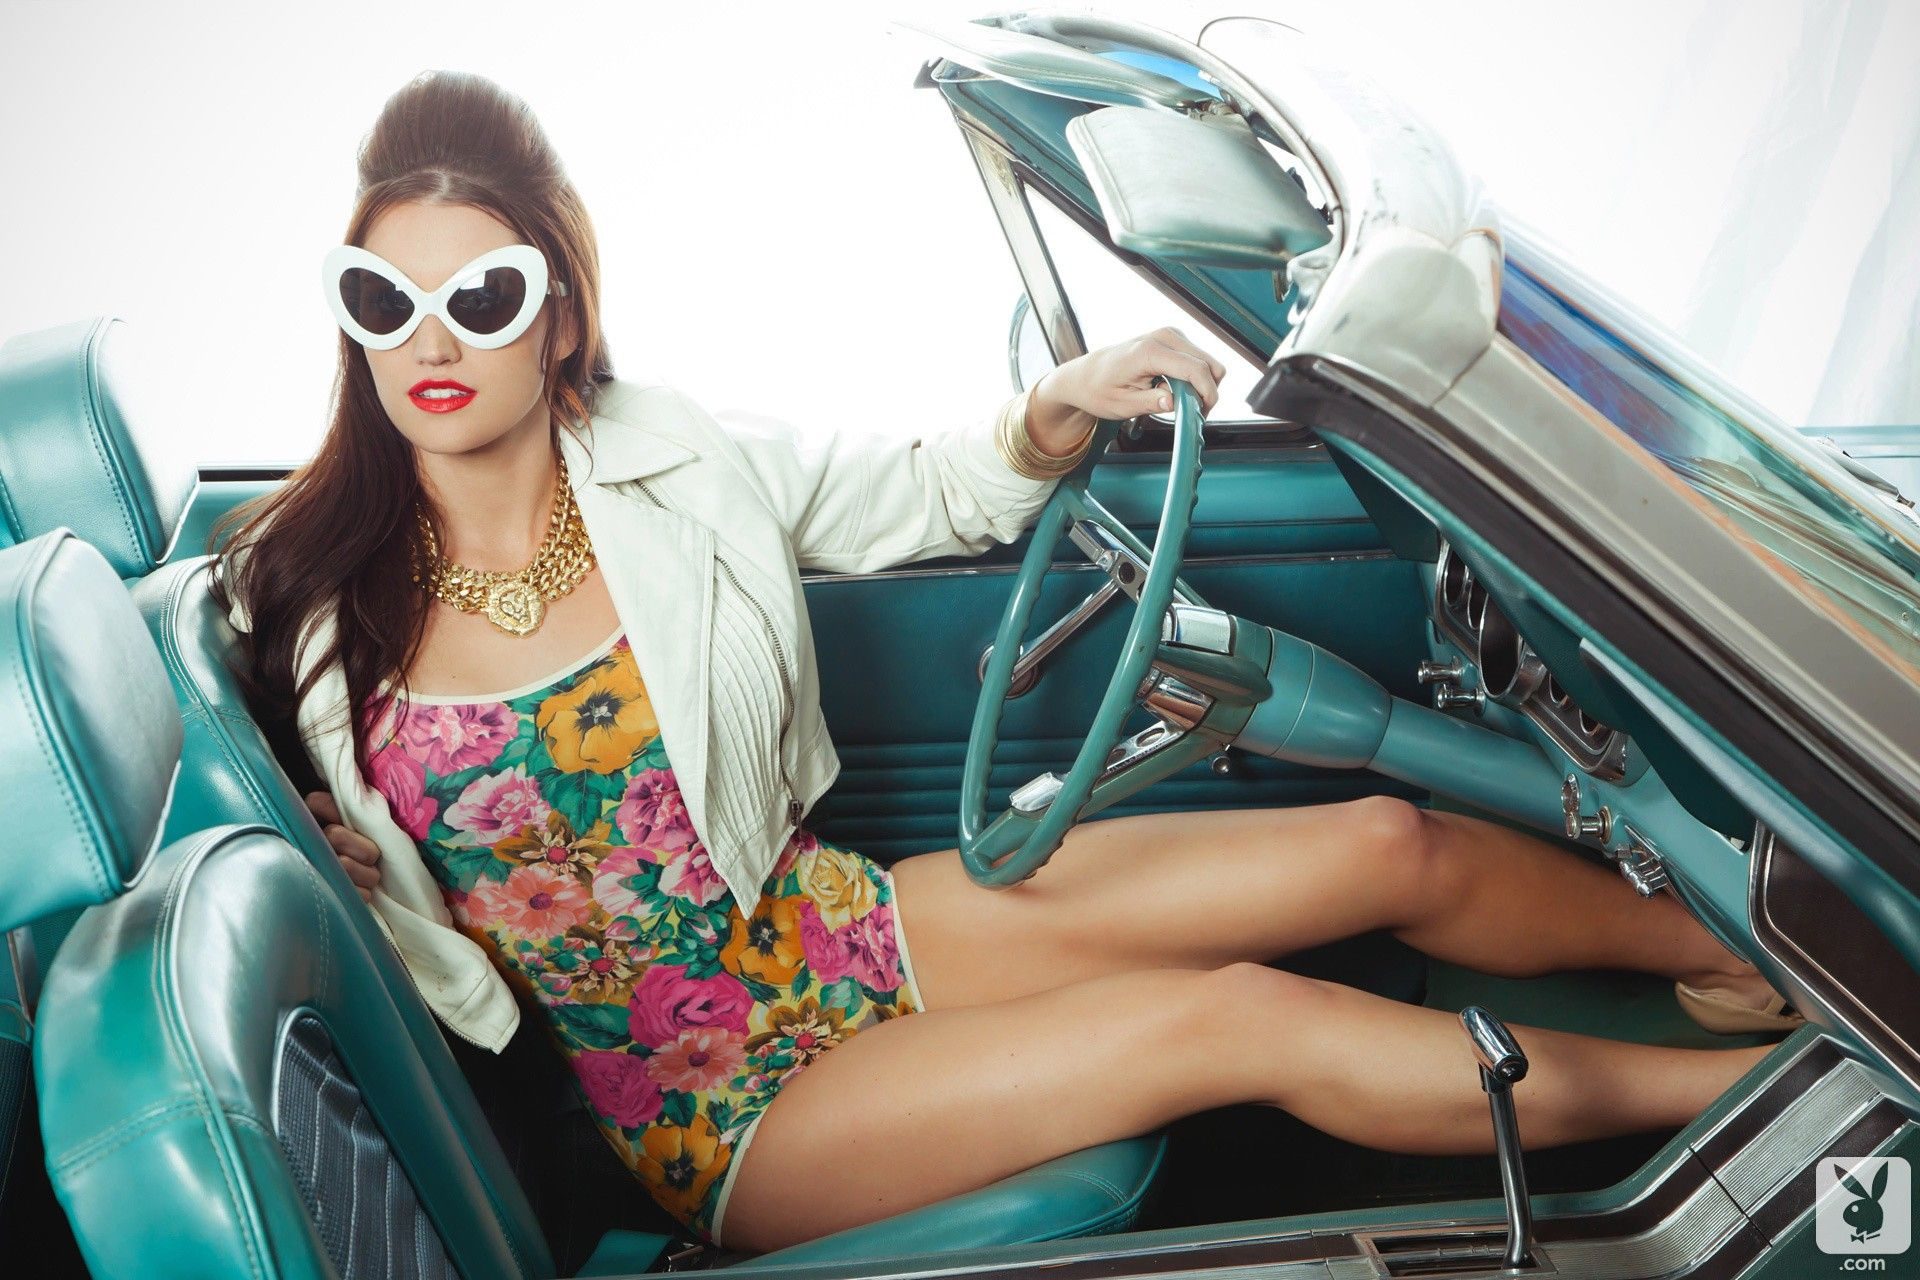 Jade Roper Playboy Pics Top jade roper does retro playboy classic photoshoot in mustang